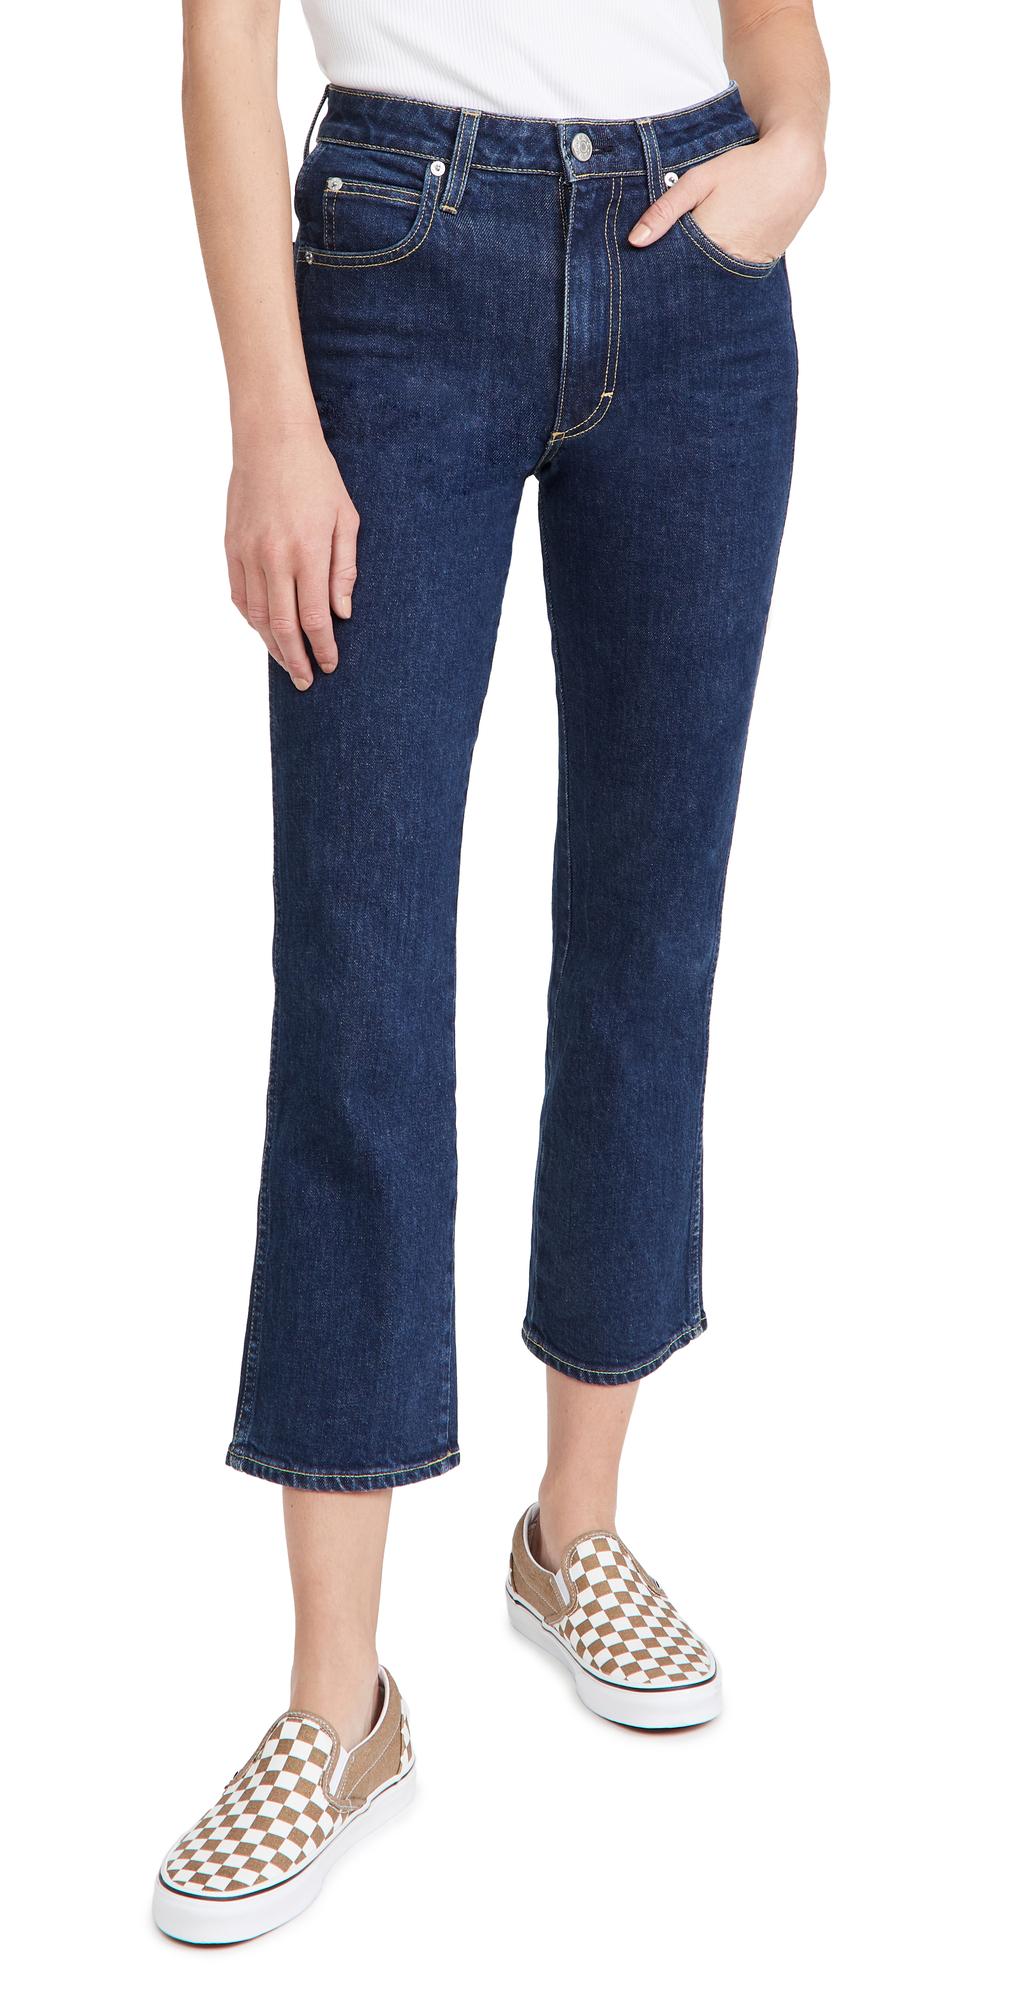 Bella Jeans